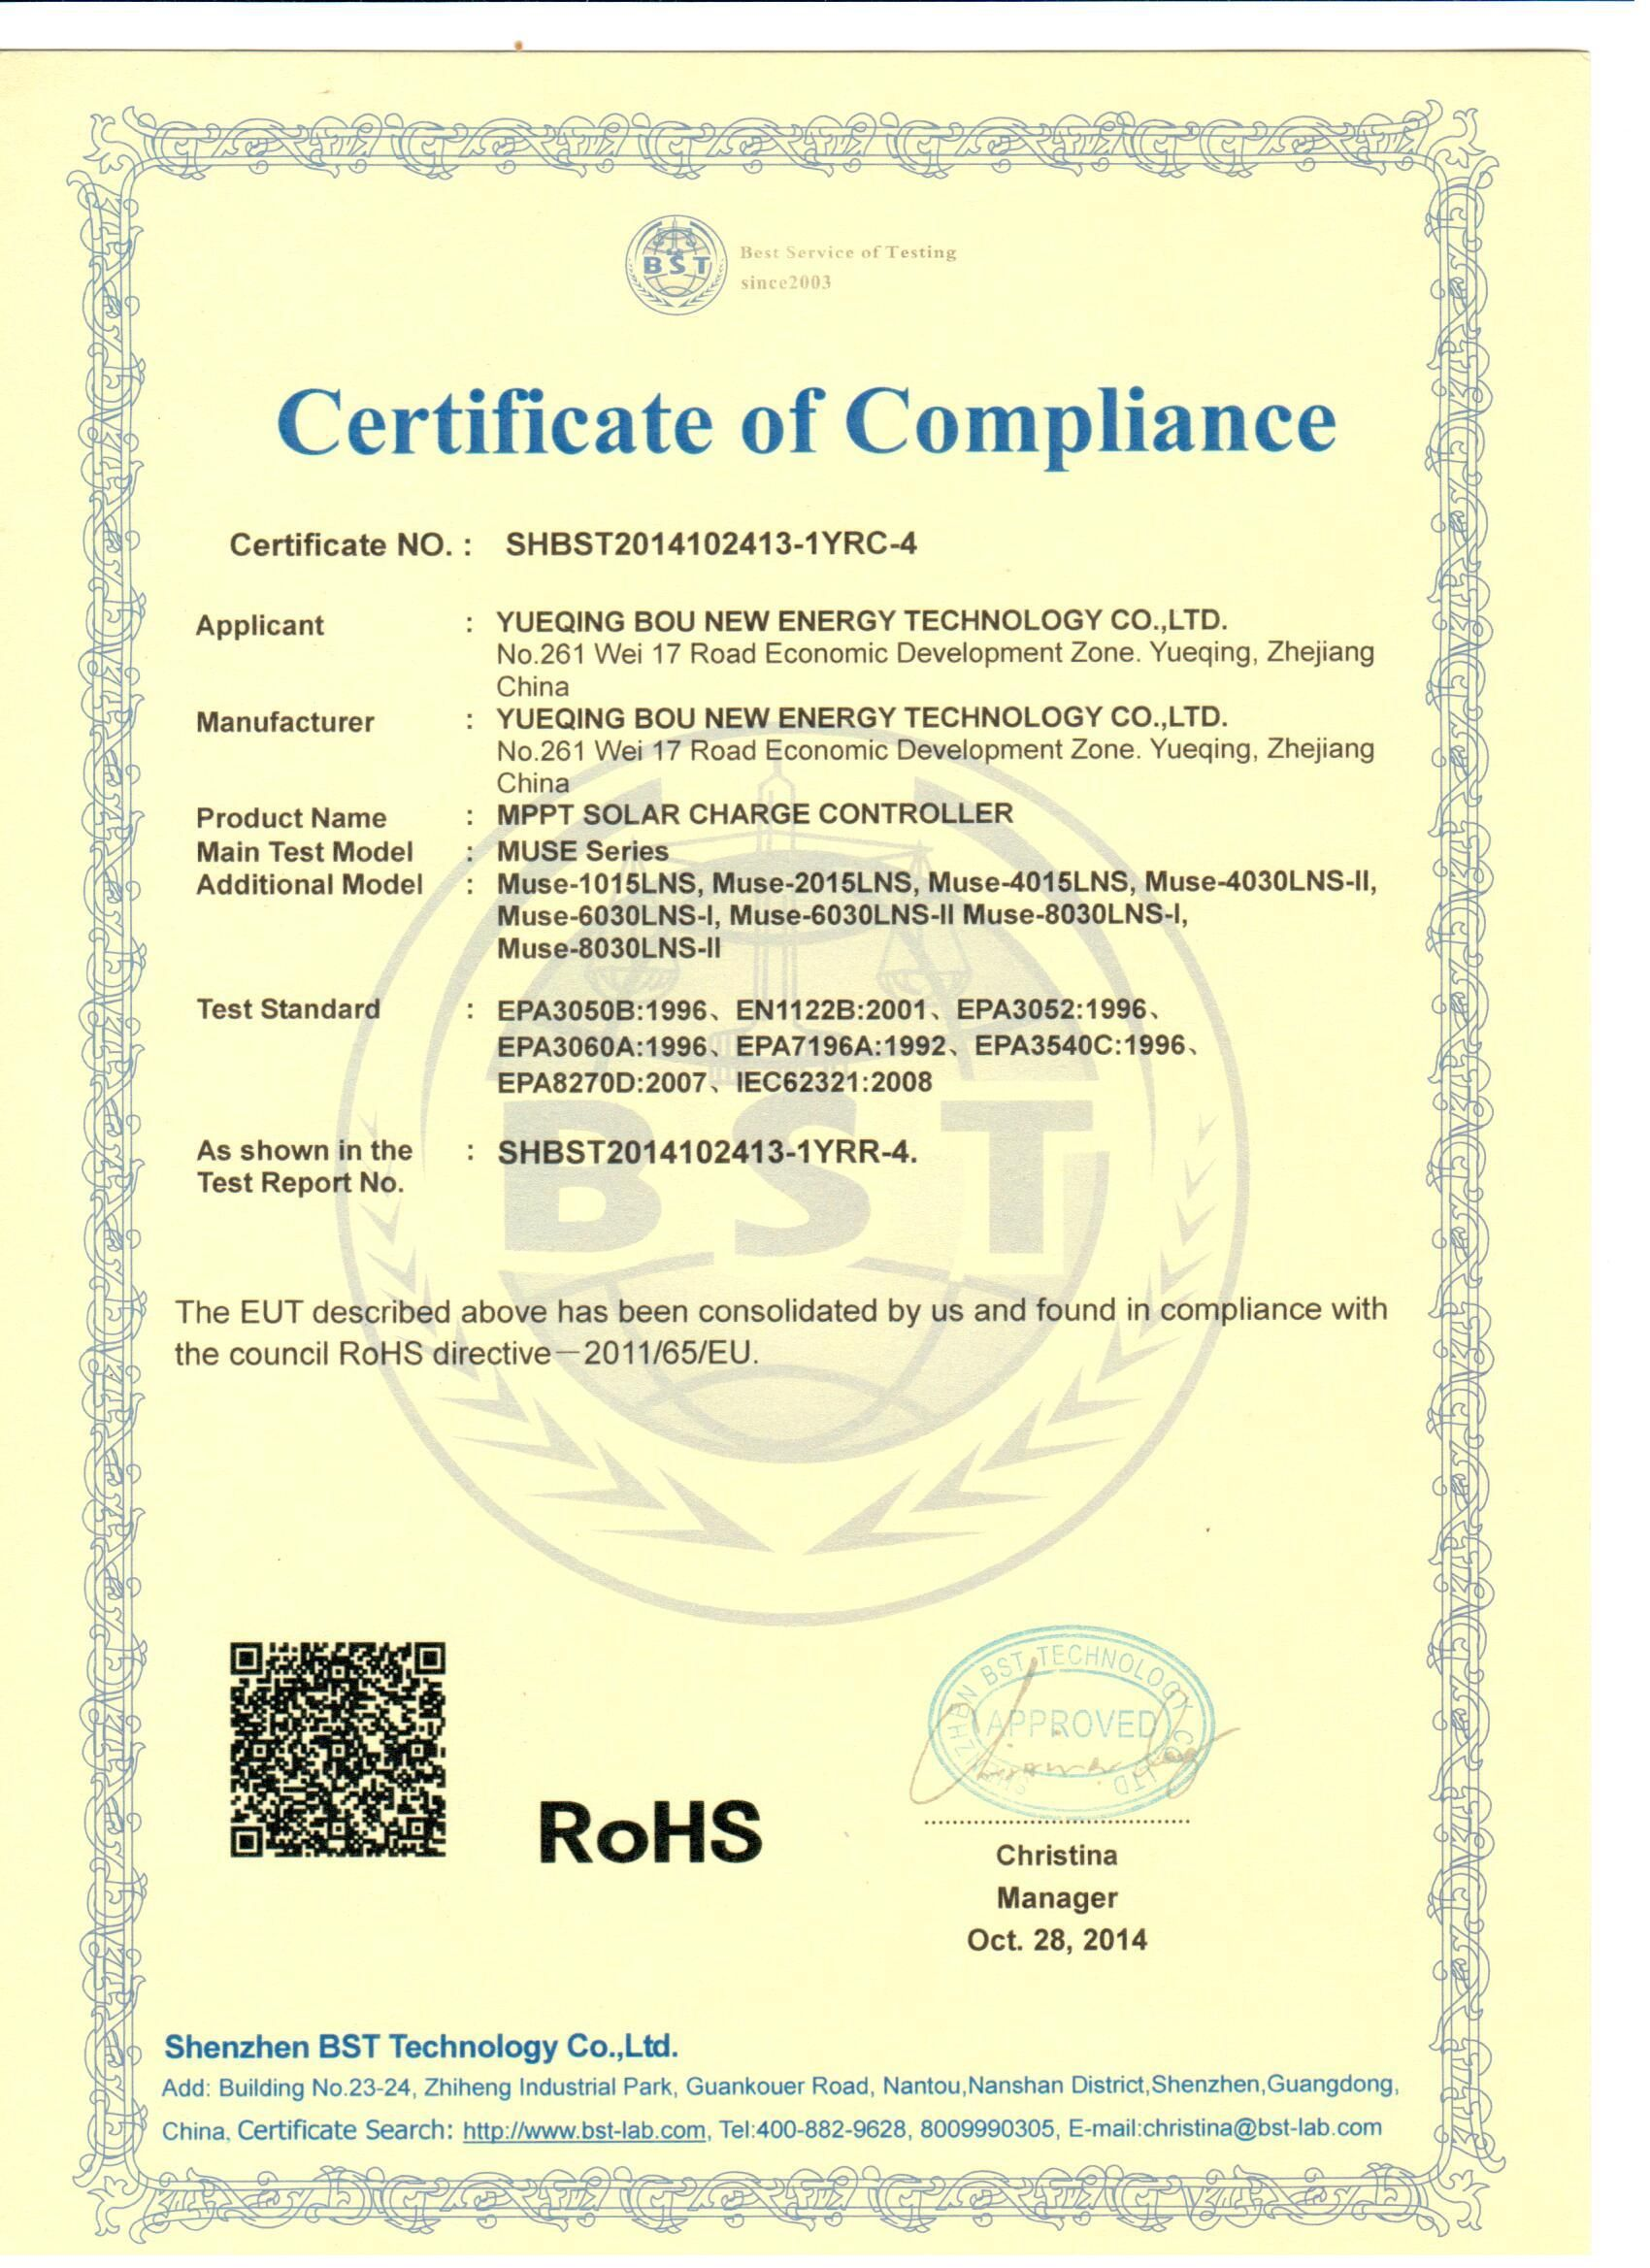 Cnbou Mppt Solar Charge Controller Rohs Certificate Economic Development Development Solar Rohs certificate of compliance template